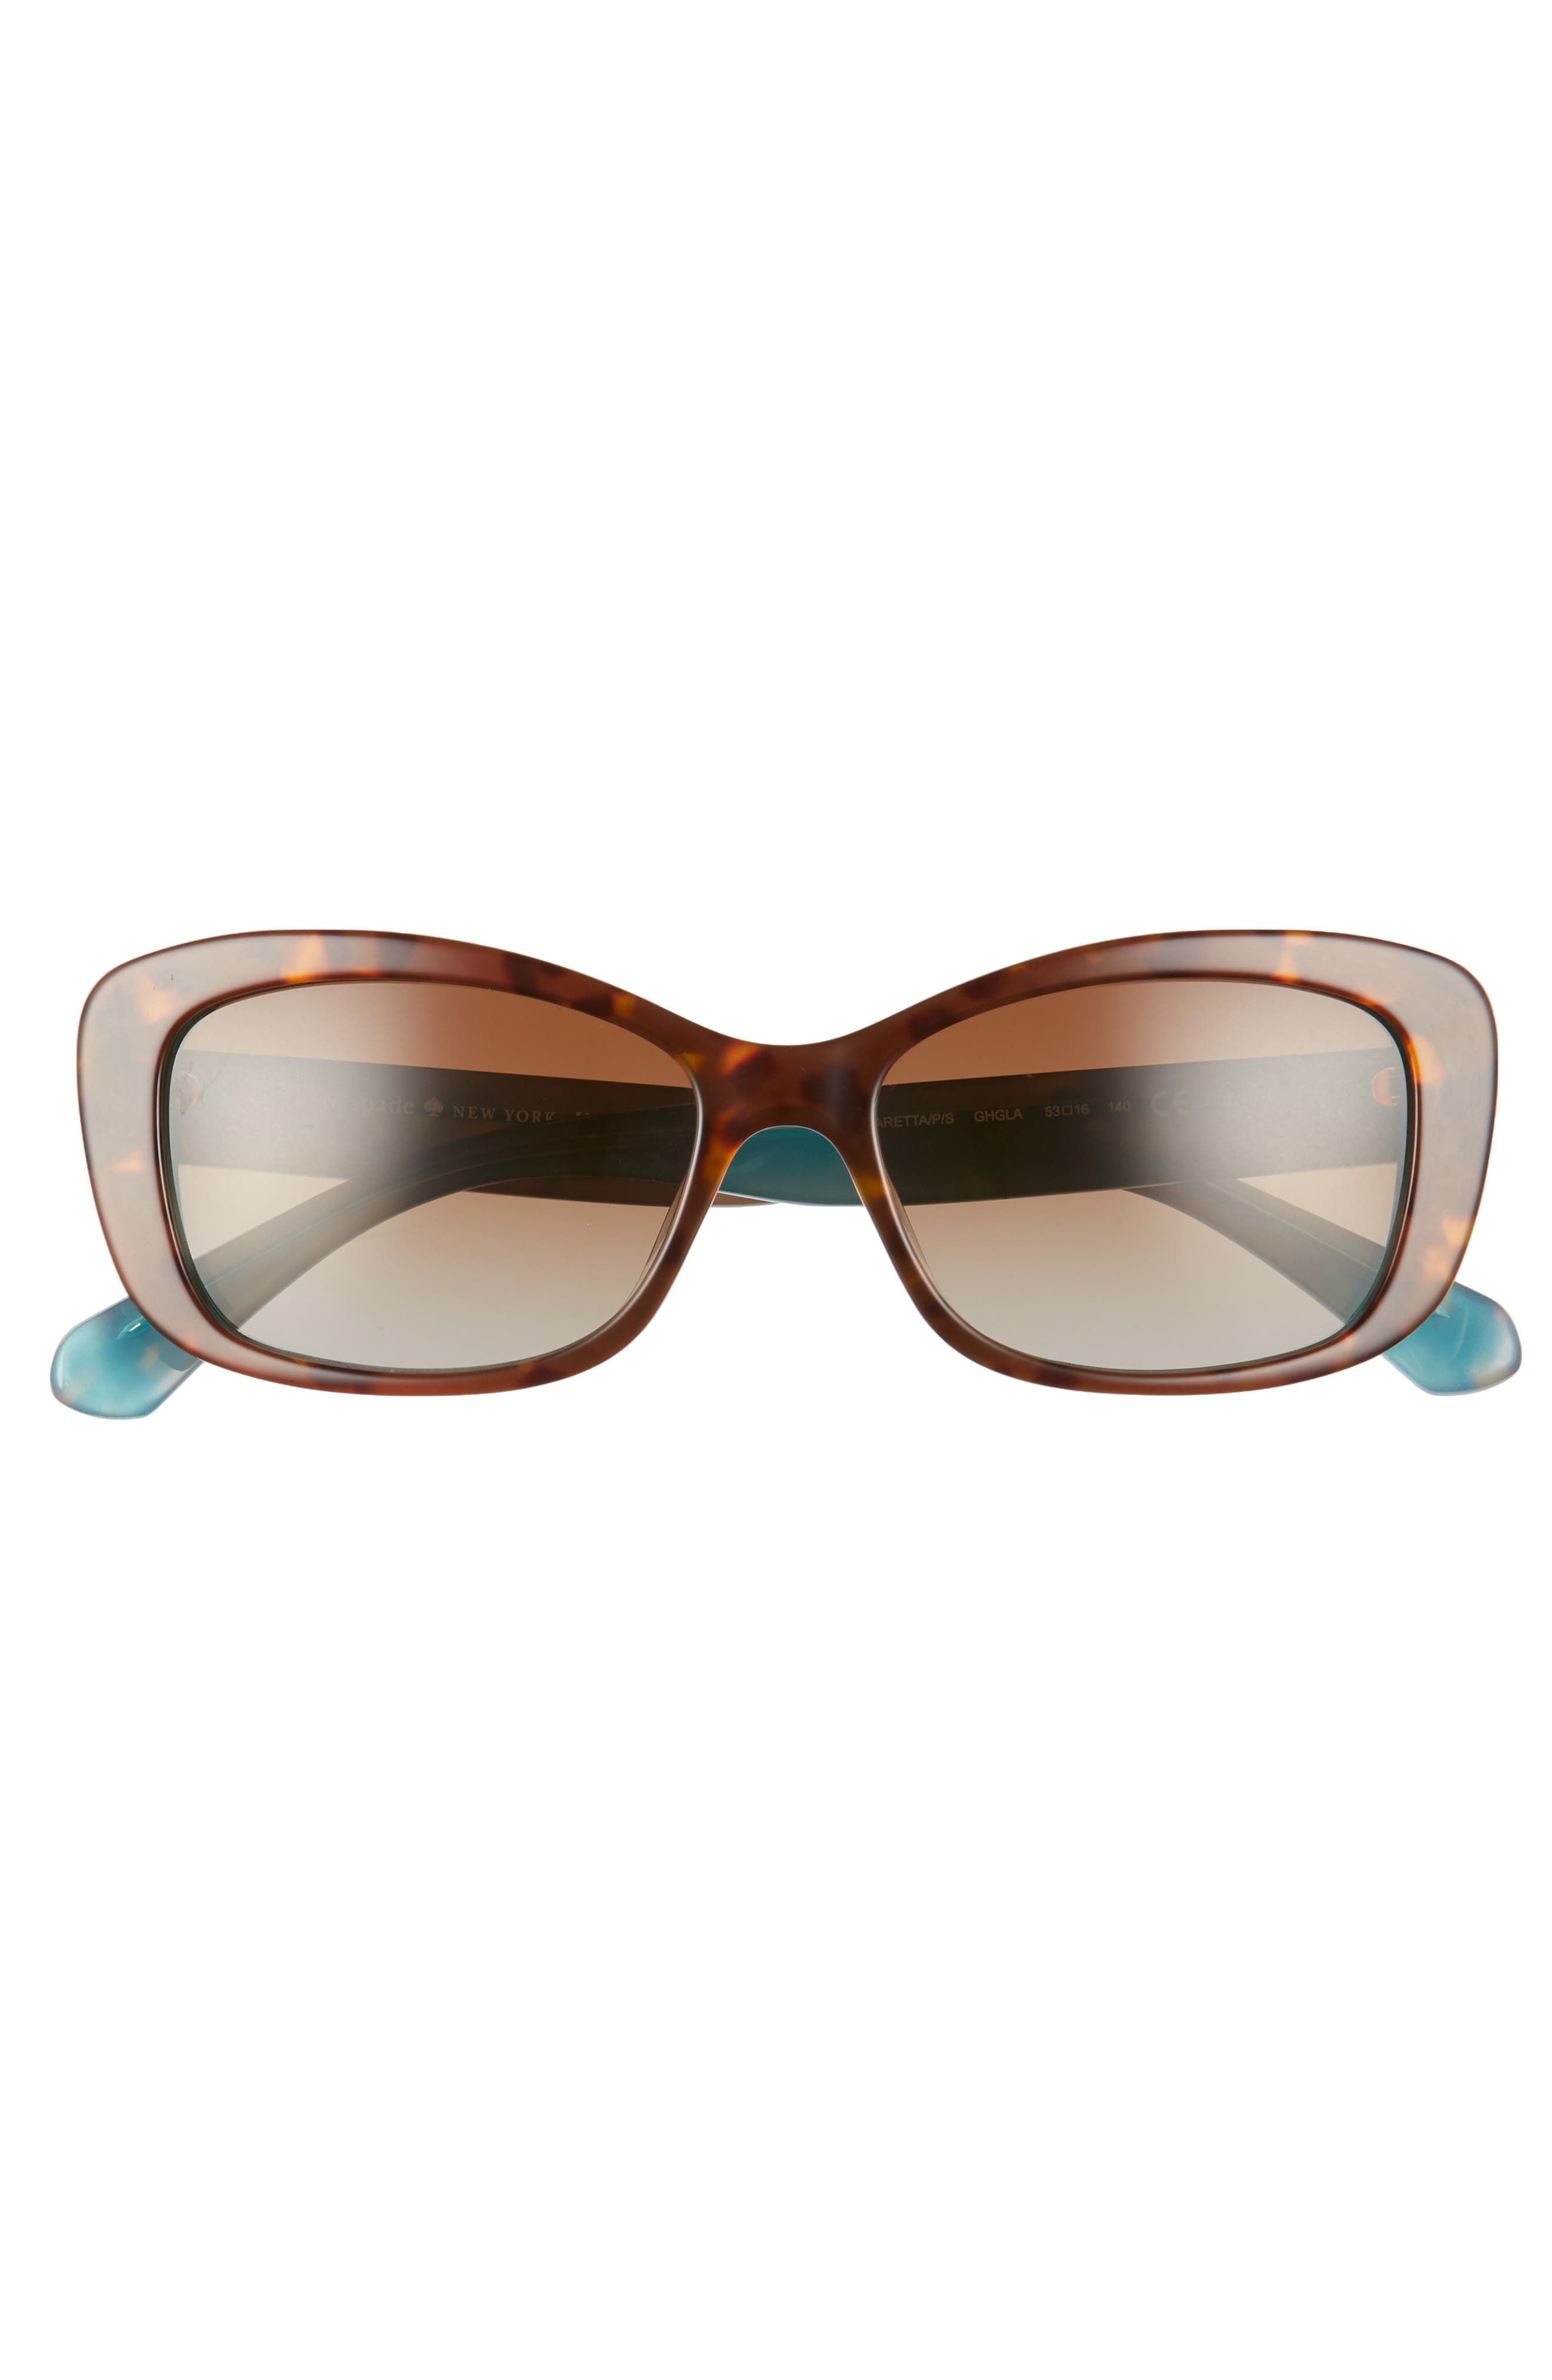 claretta 53mm polarized sunglasses,                             Alternate thumbnail 3, color,                             Havana/ Aqua